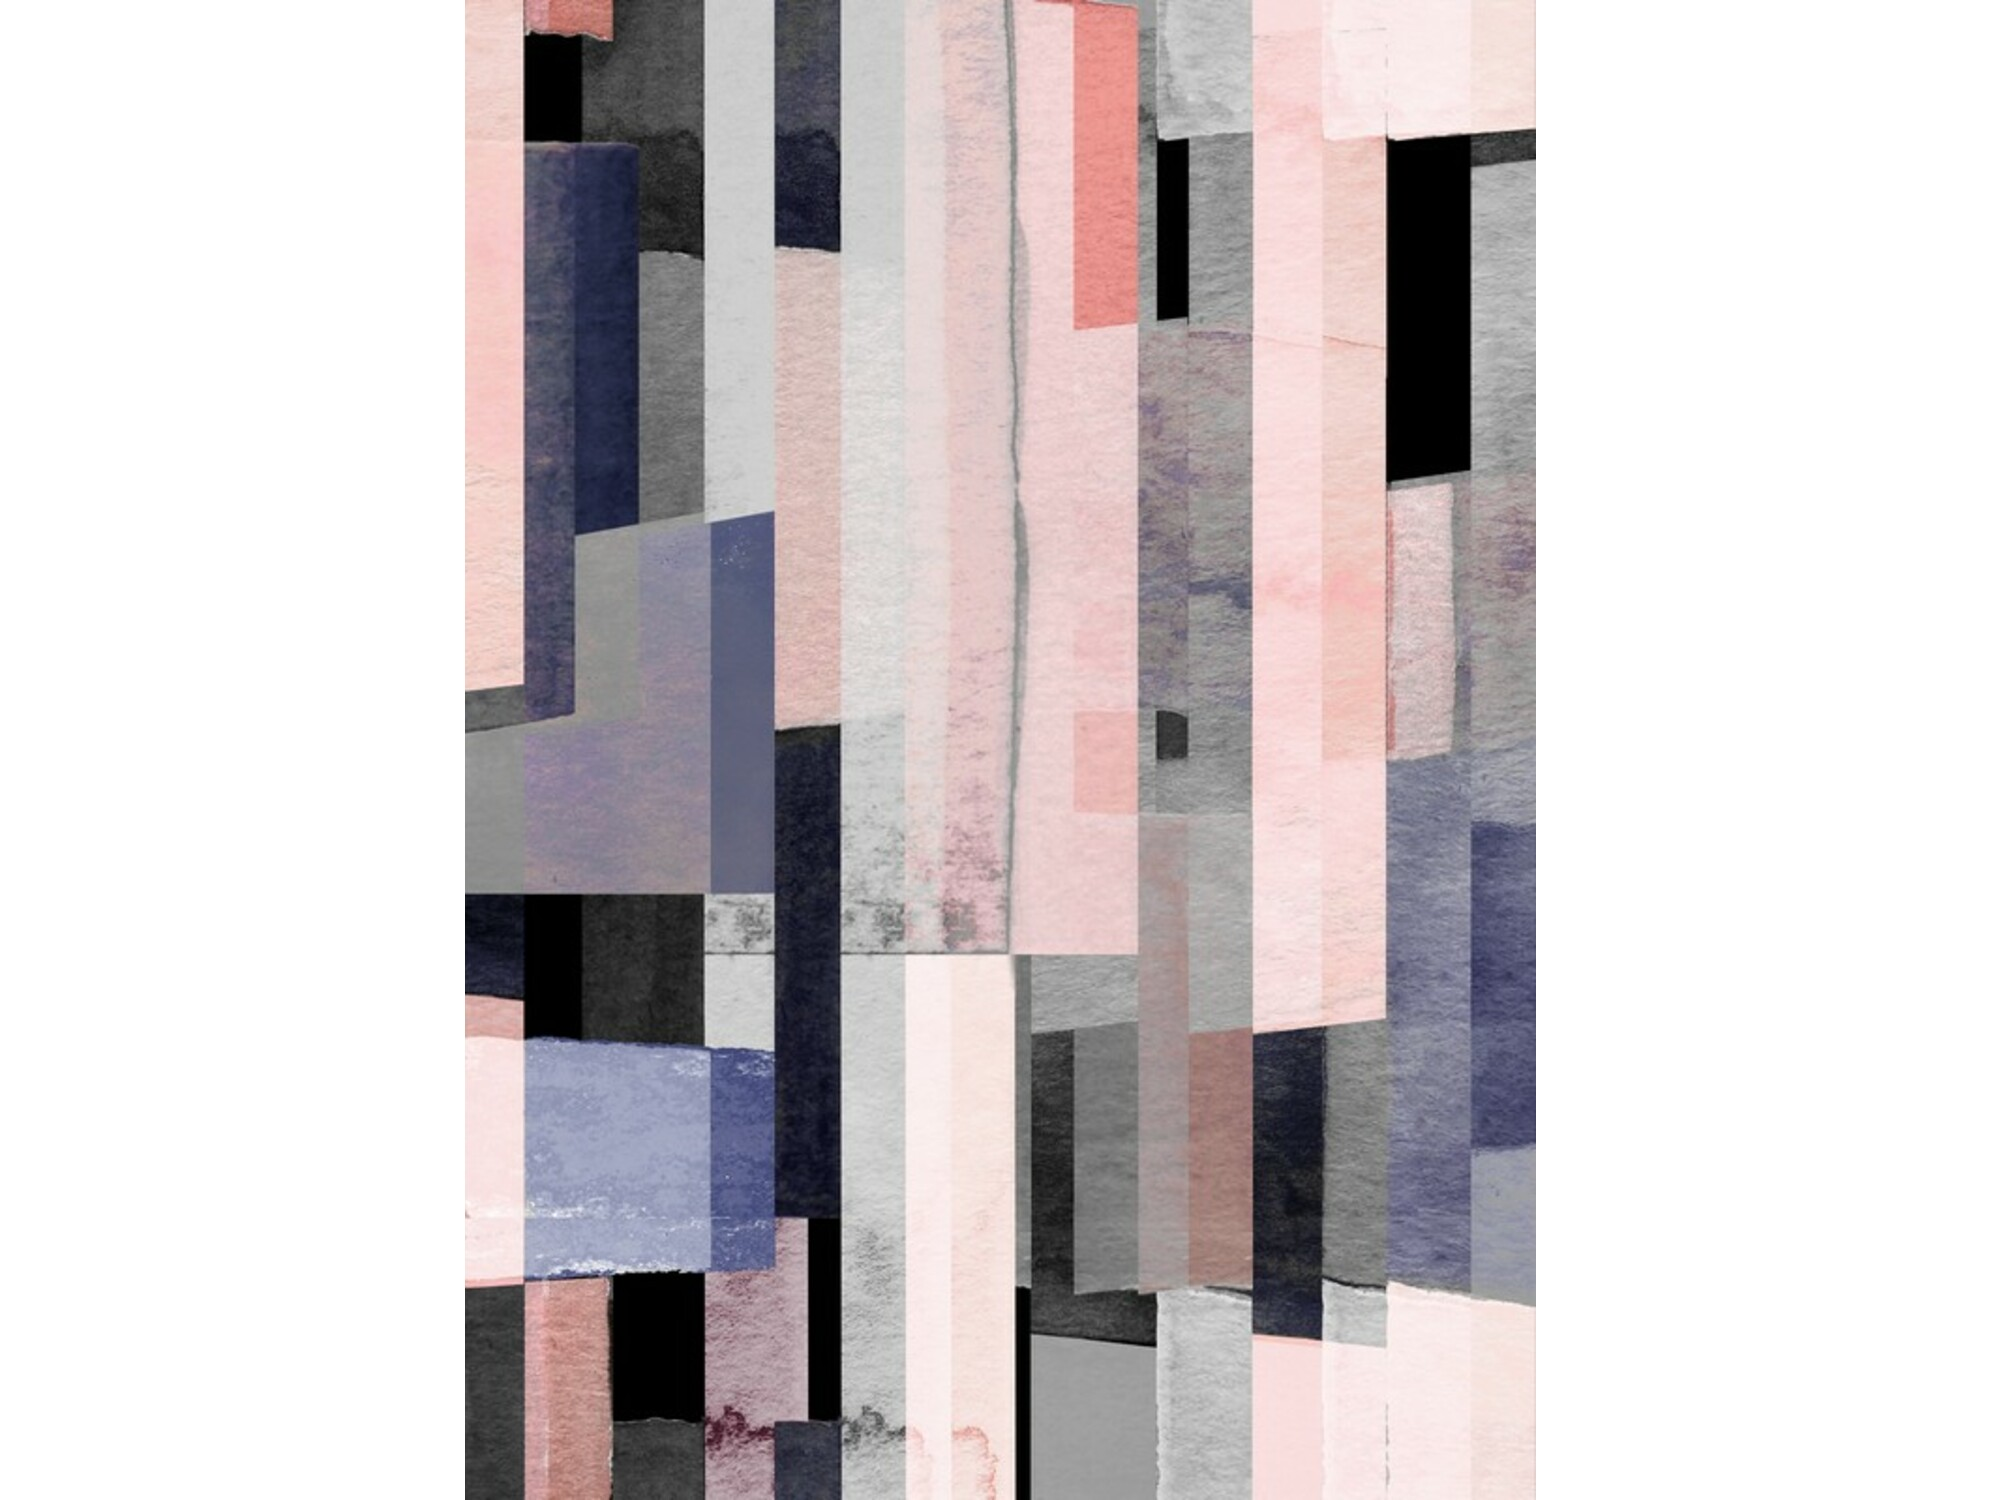 DekorDom Slika 80x120cm Toir23234